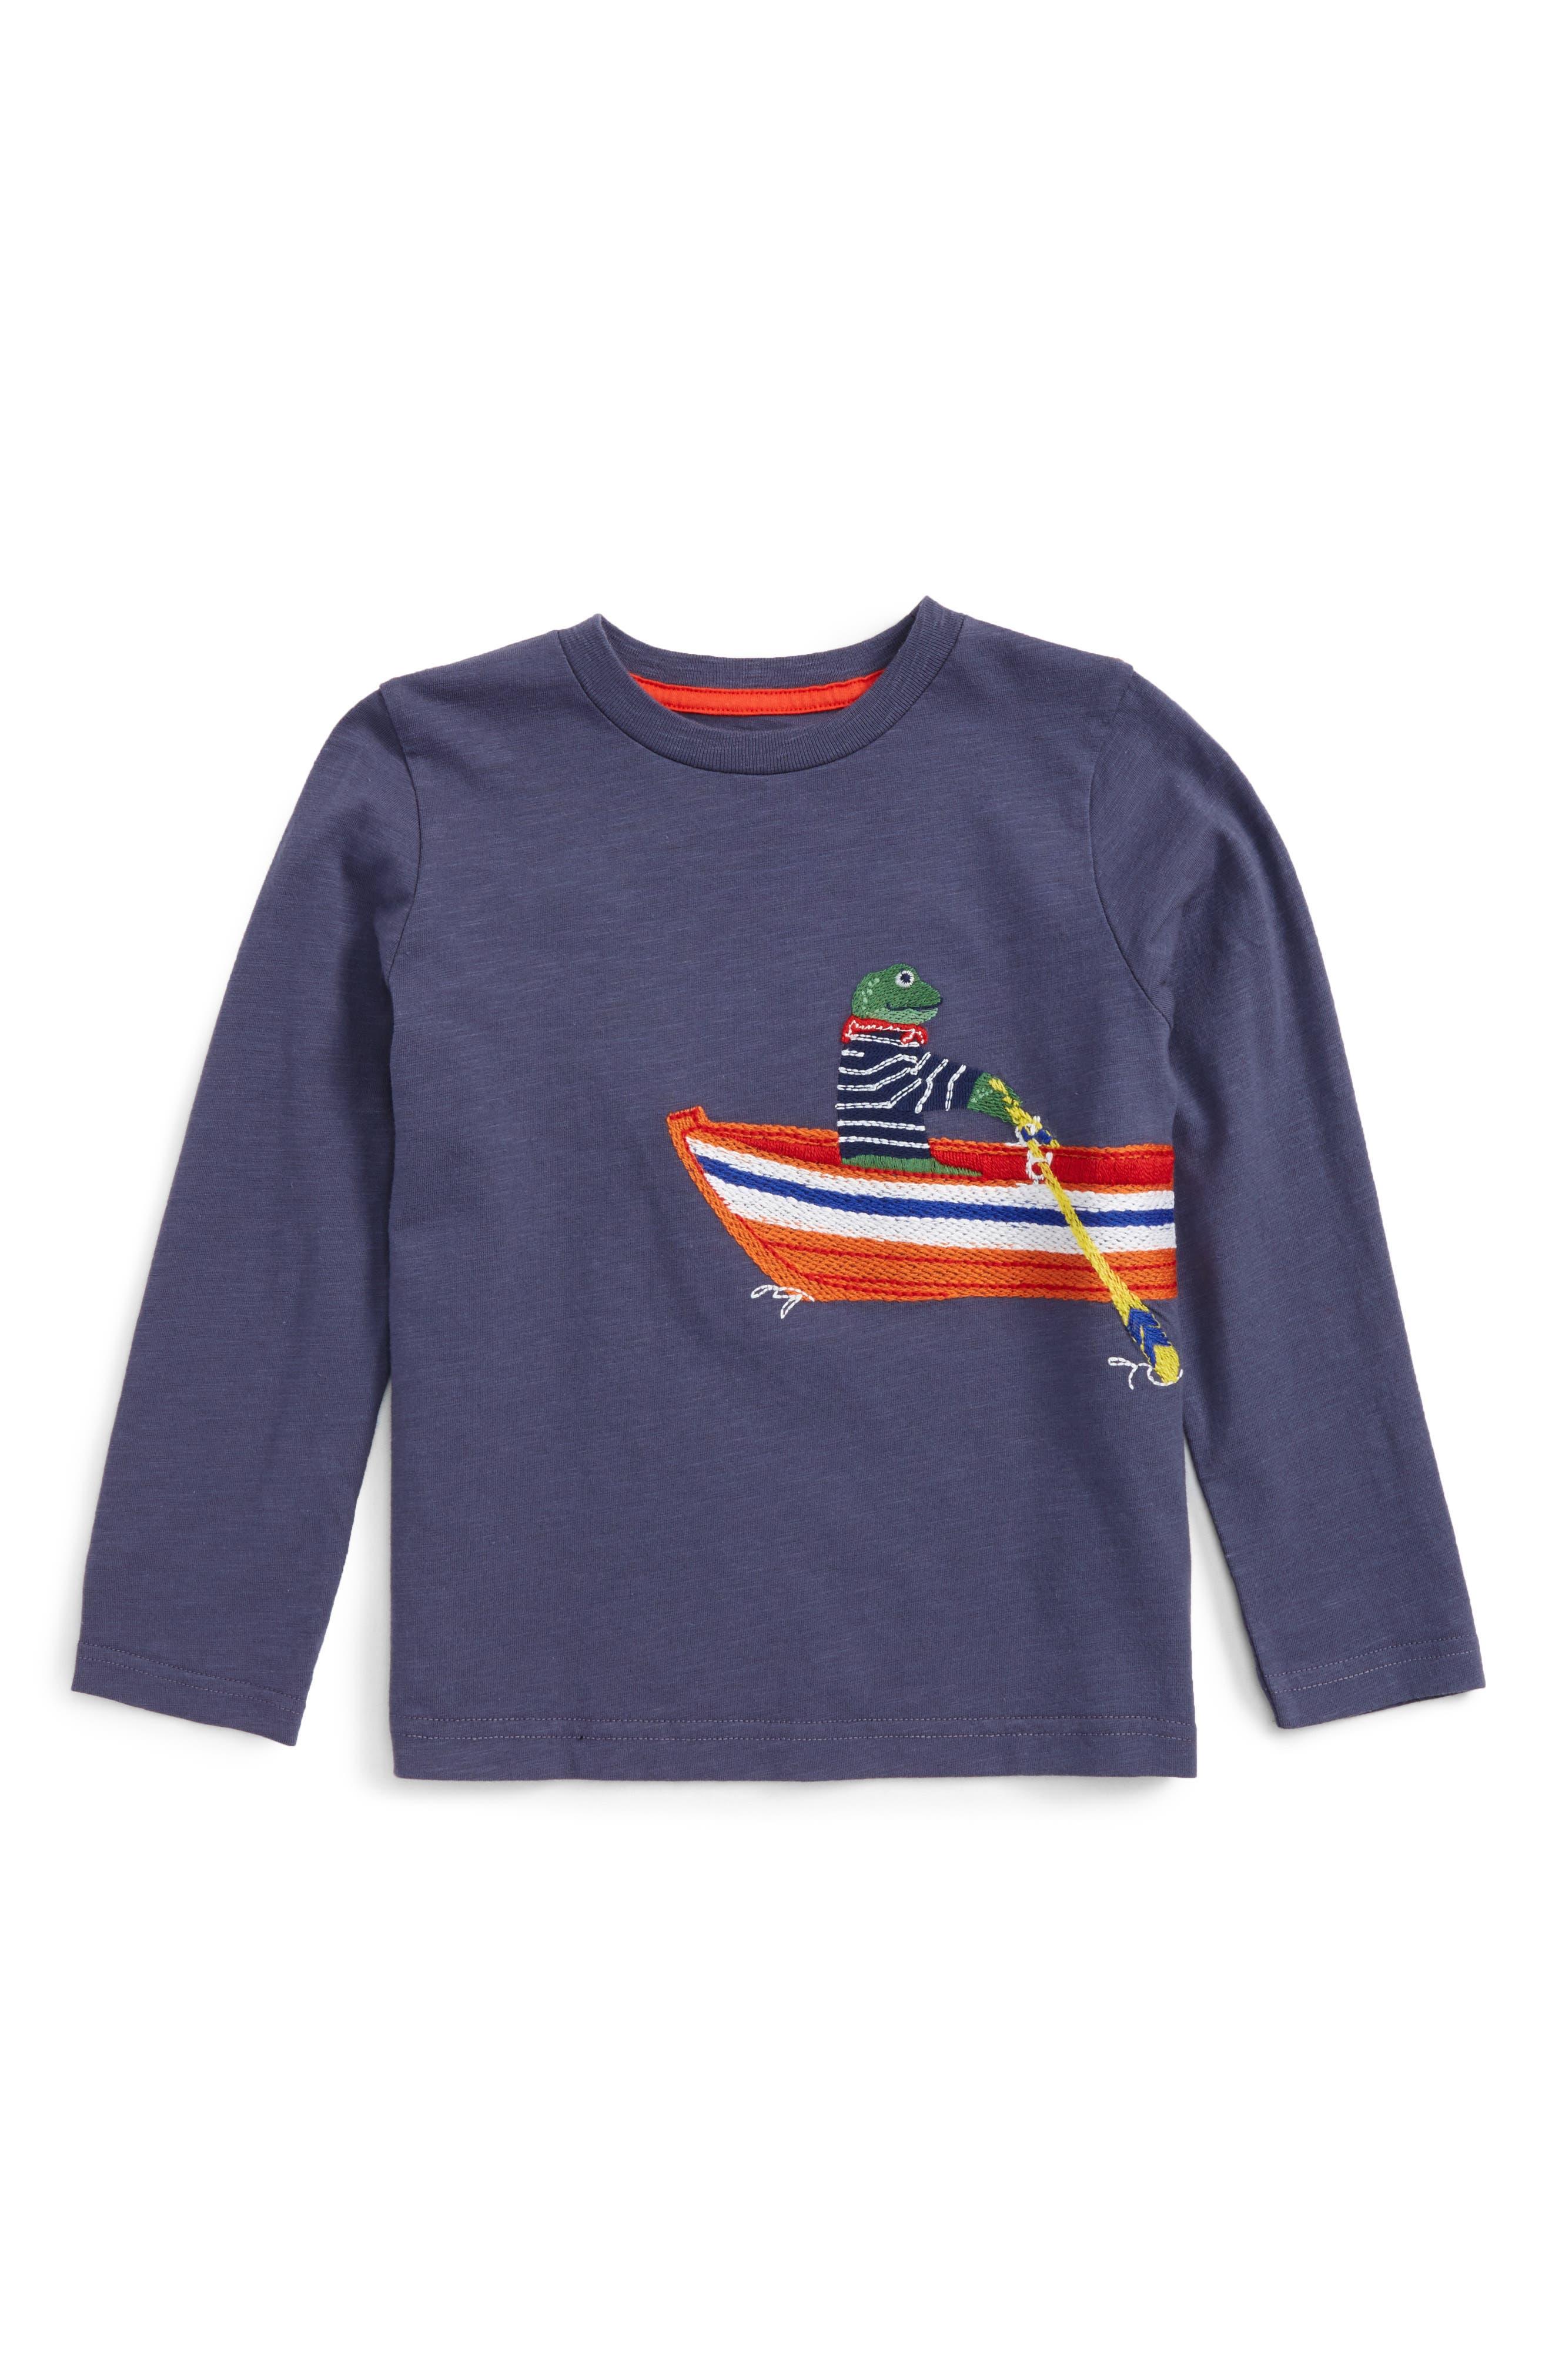 Main Image - Mini Boden Superstitch T-Shirt (Toddler Boys, Little Boys & Big Boys)